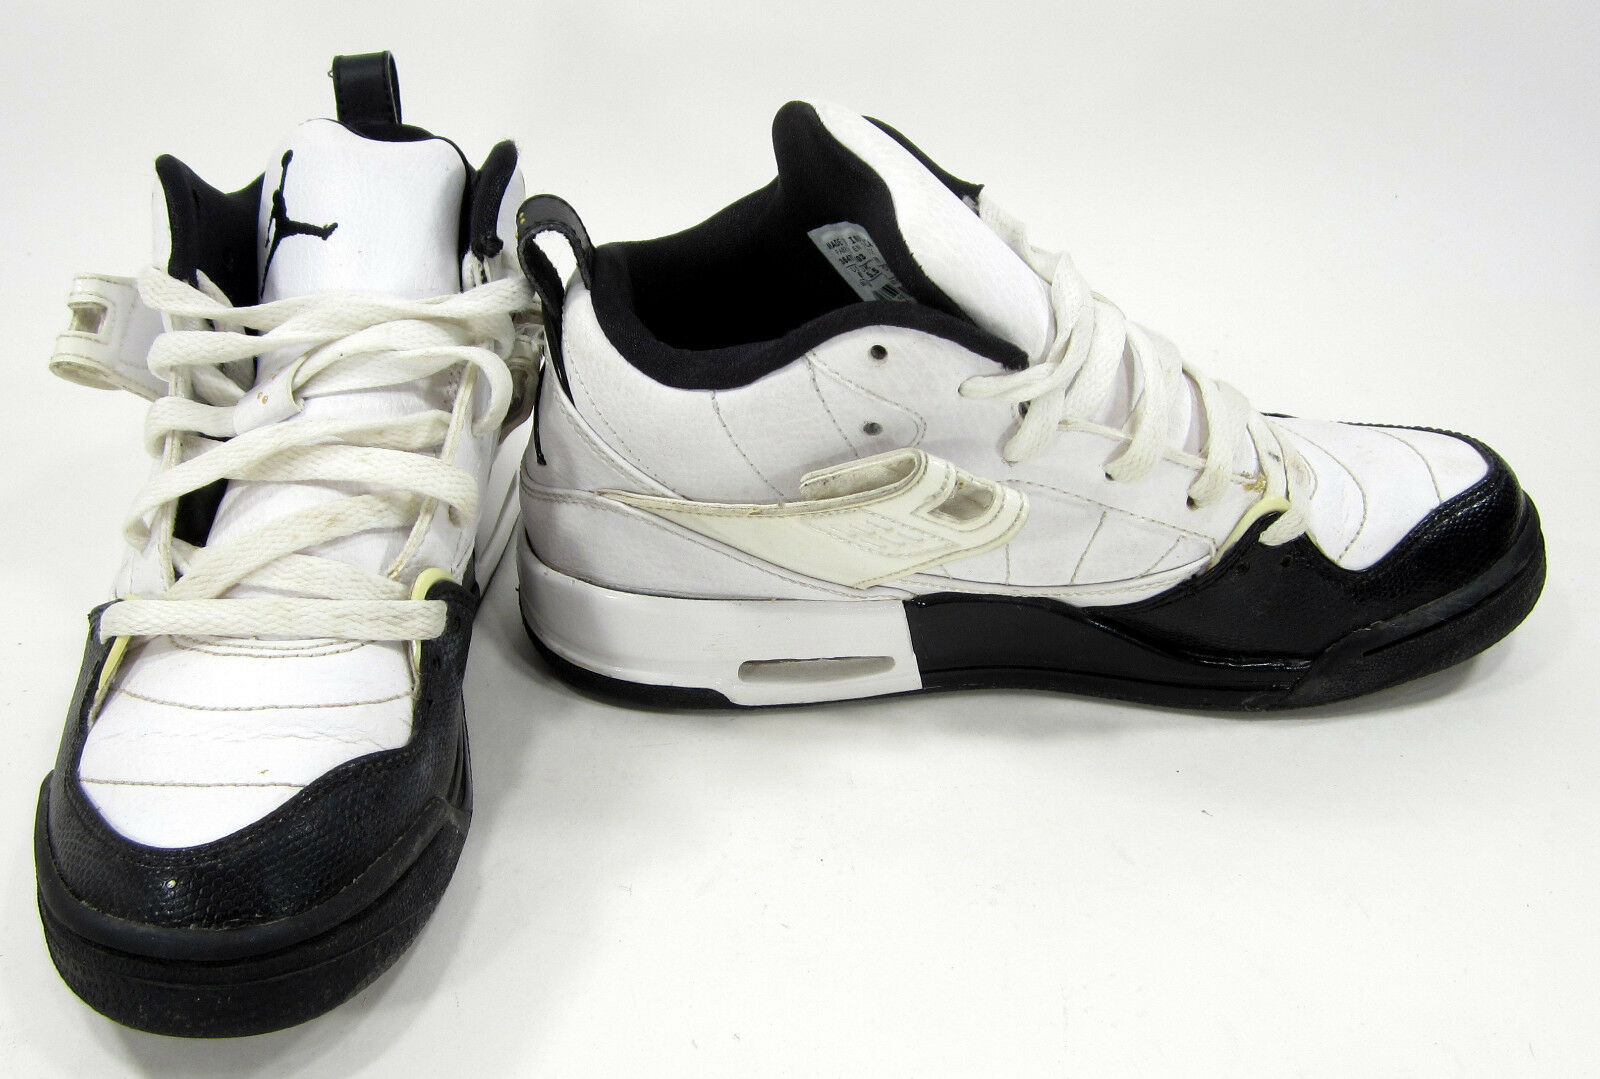 Nike Shoes Jordan Flight Size 45 Juniors White/Black Sneakers Size Flight 6 ccda36